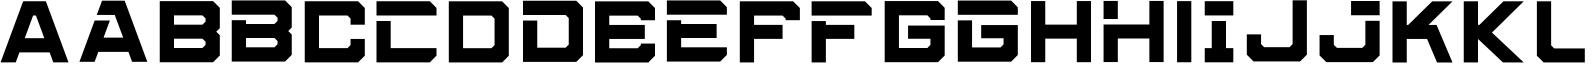 Cybero